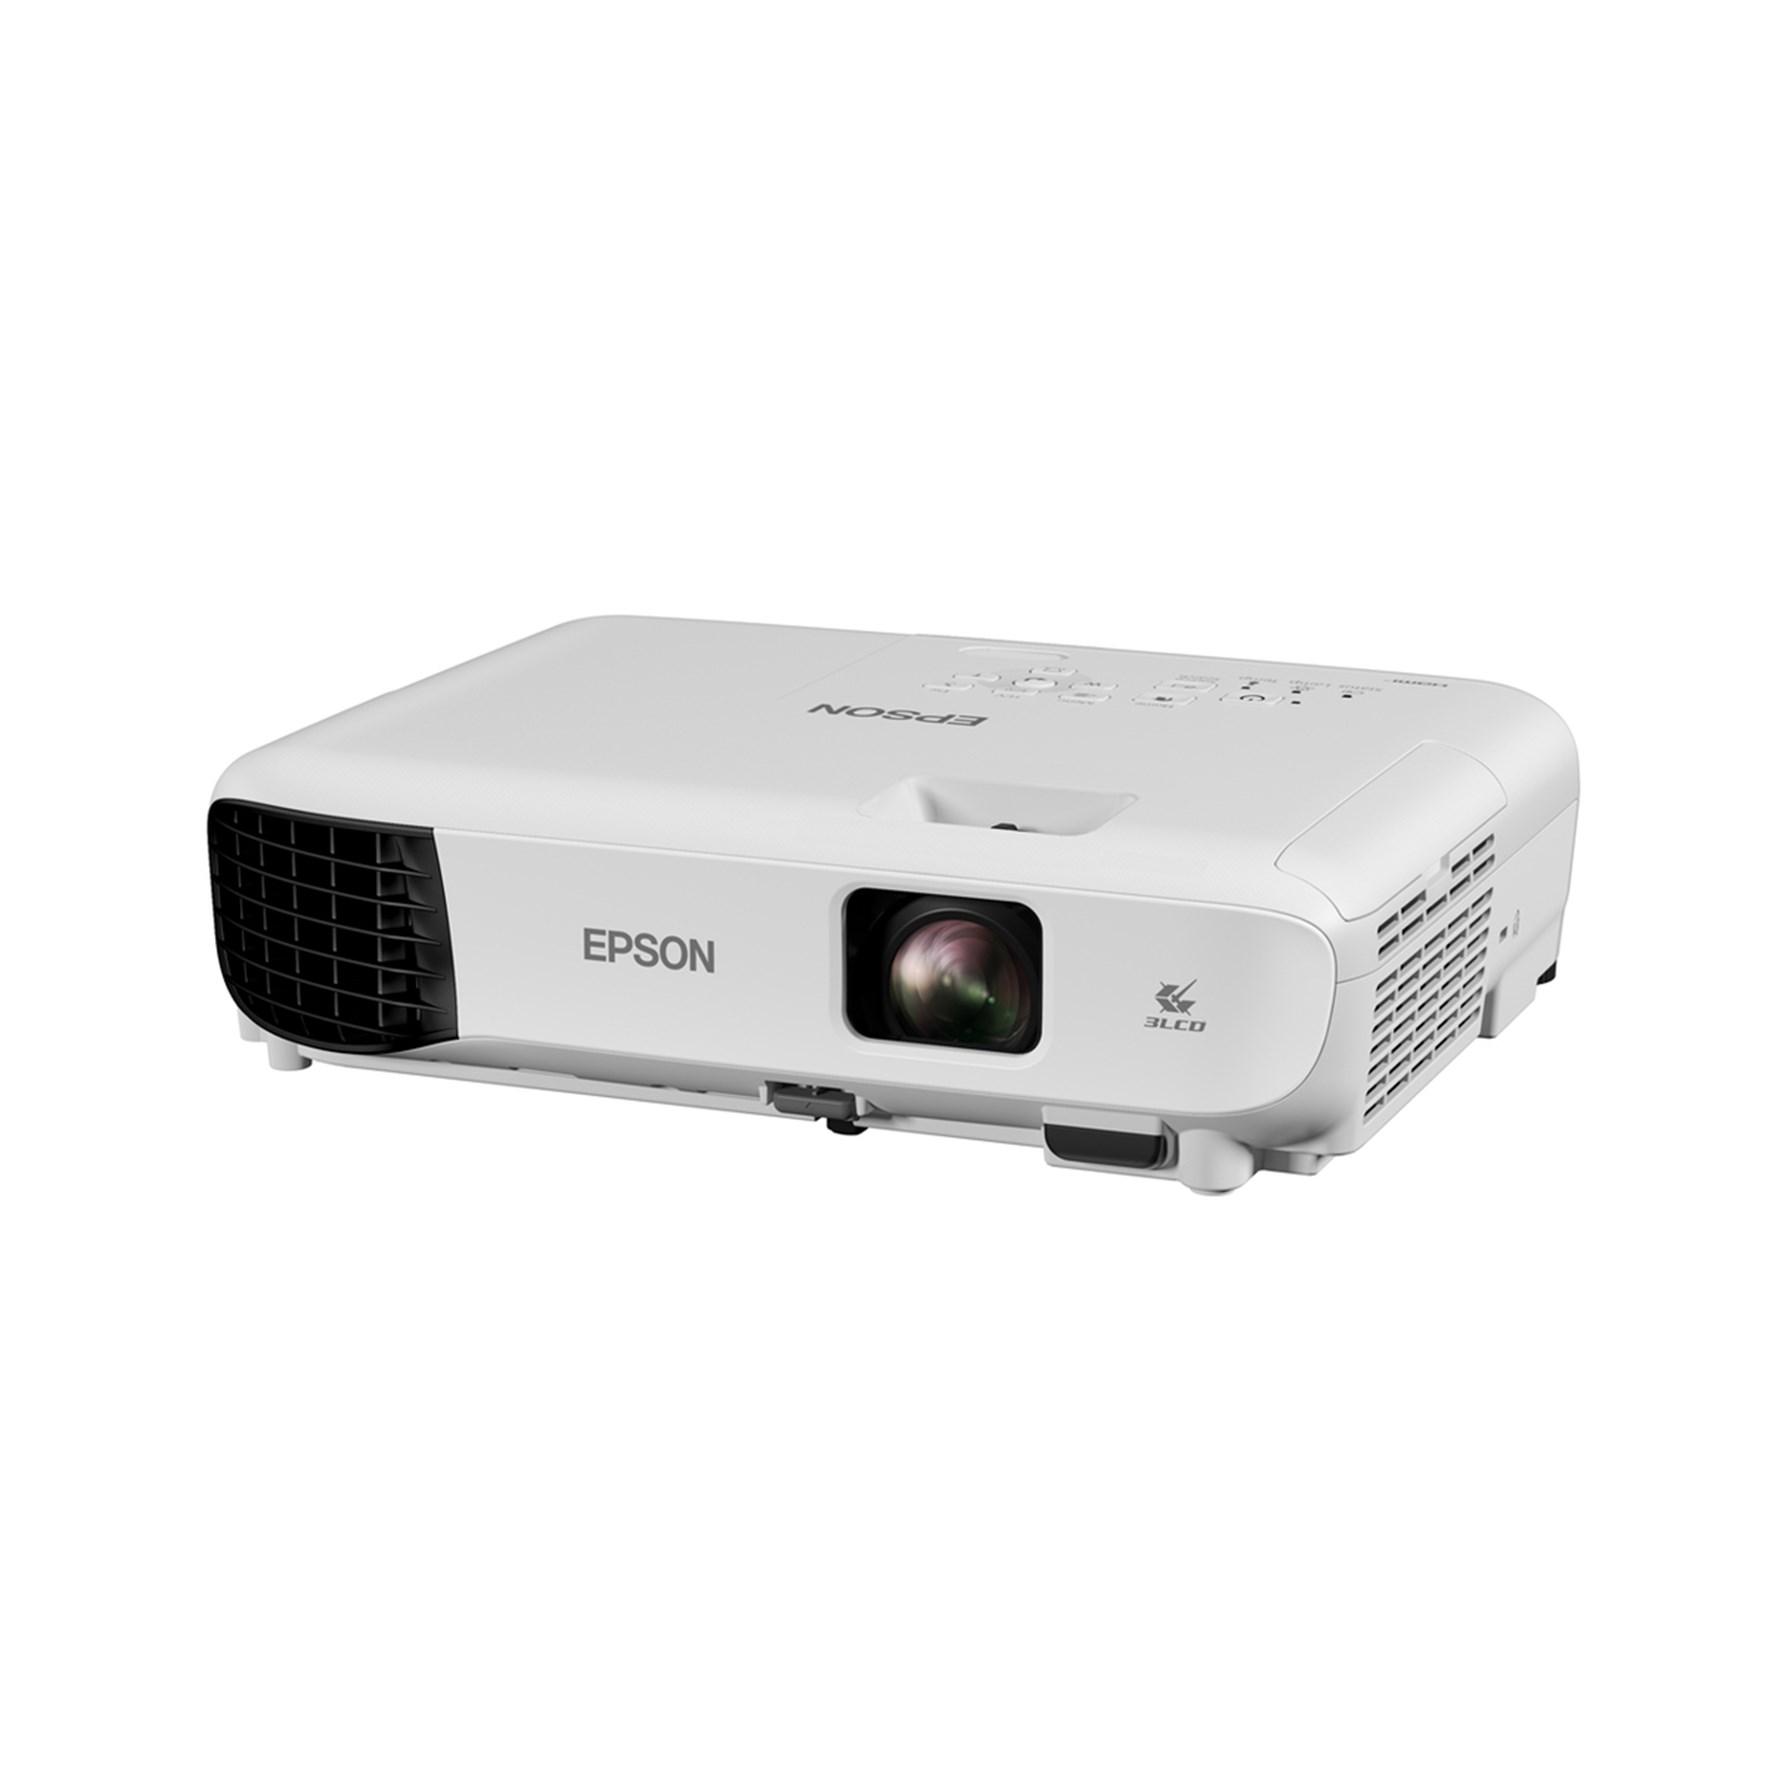 Projetor Epson E10+ 3600 Lumens XGA HDMI USB V11H975021